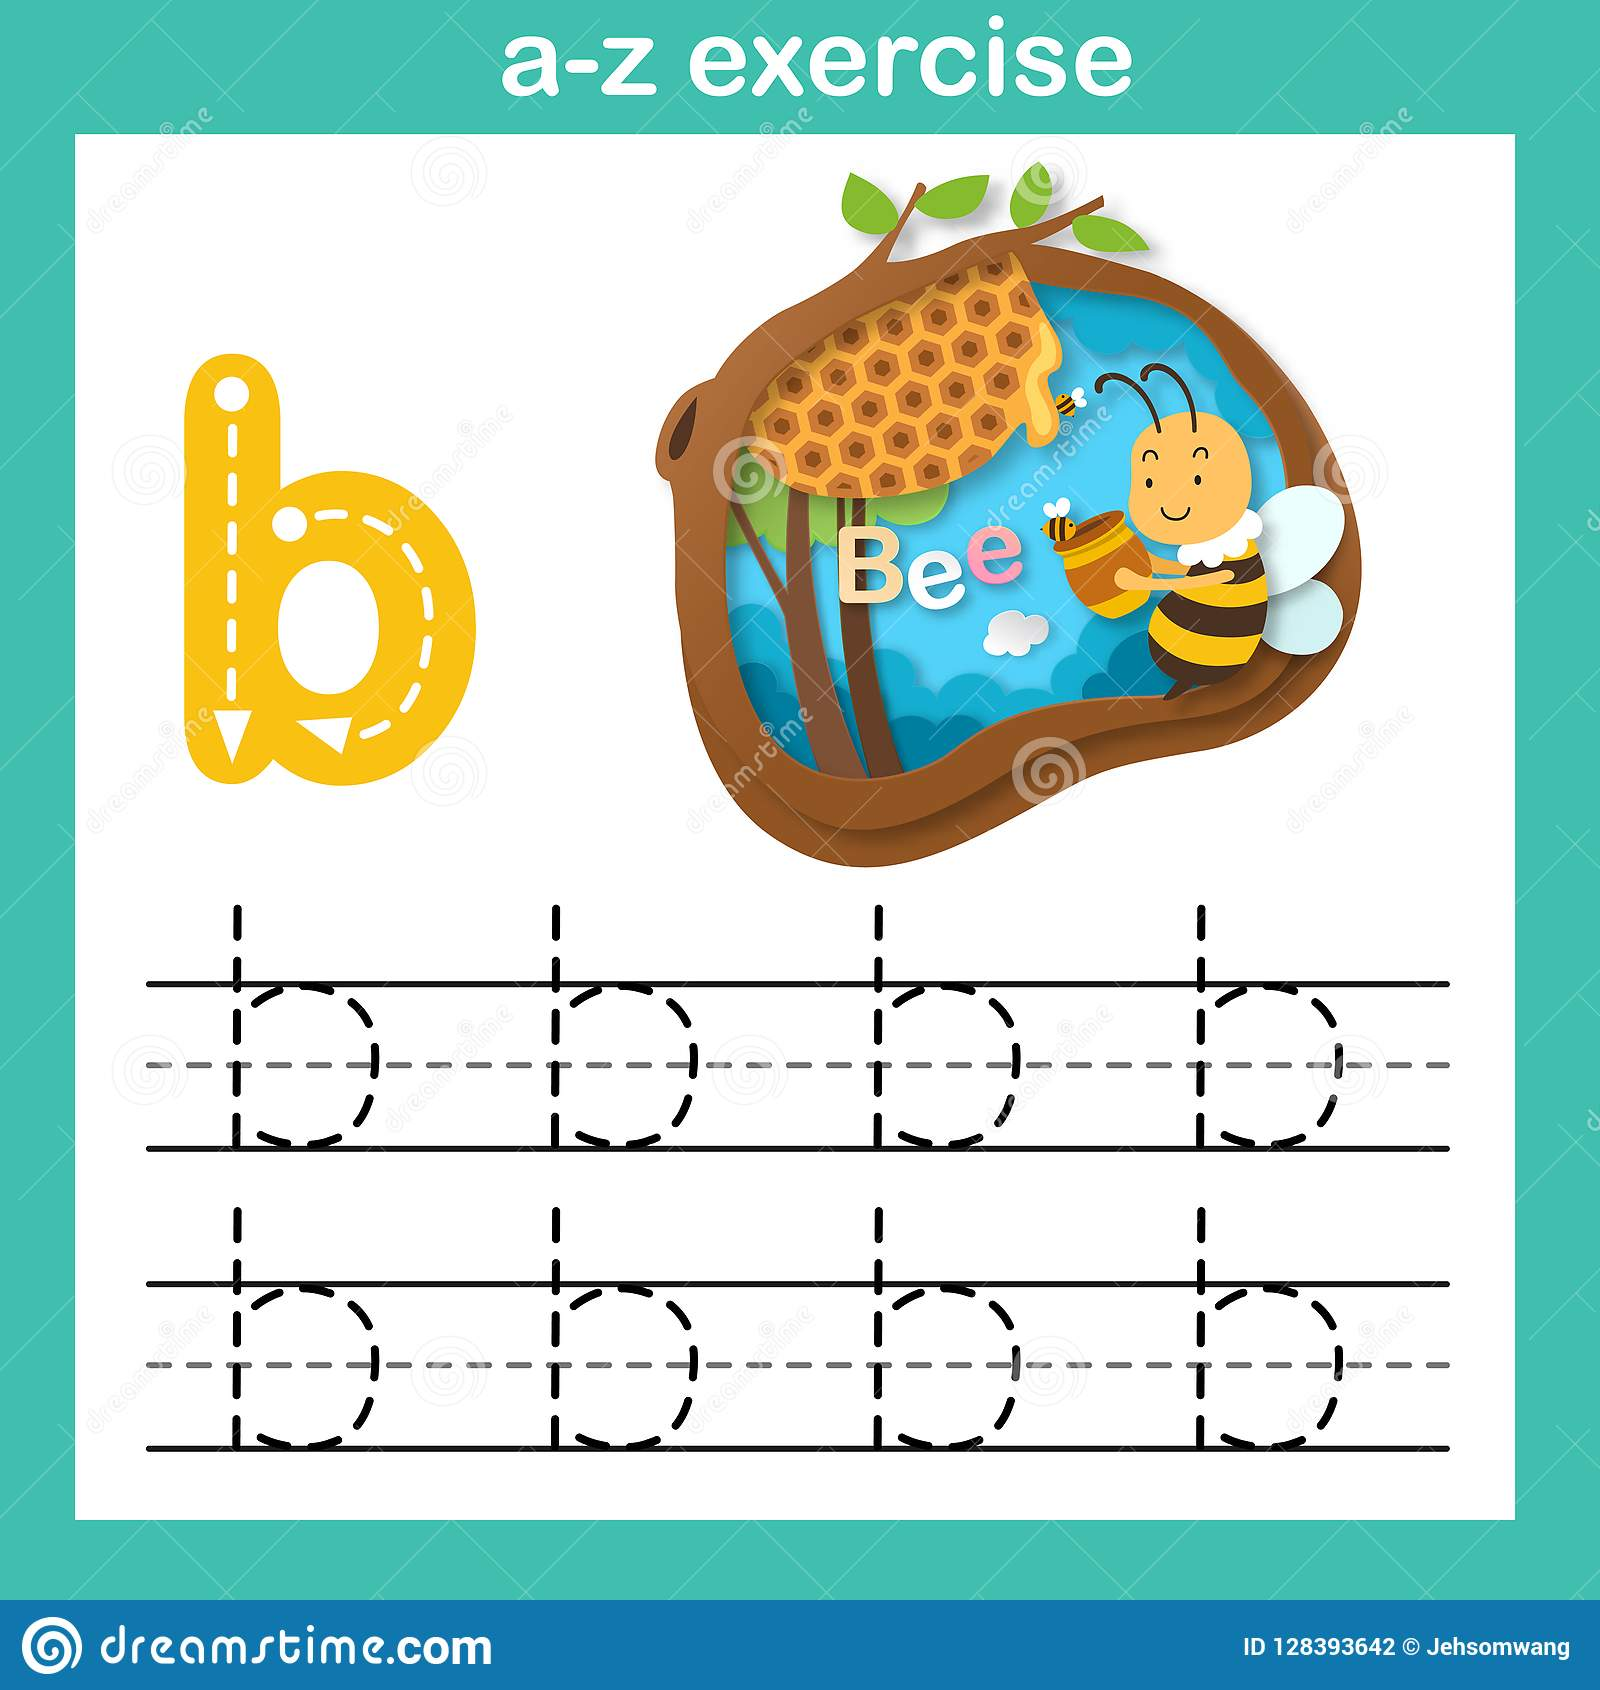 Alphabet Letter B Bee Exercise Paper Cut Concept Stock